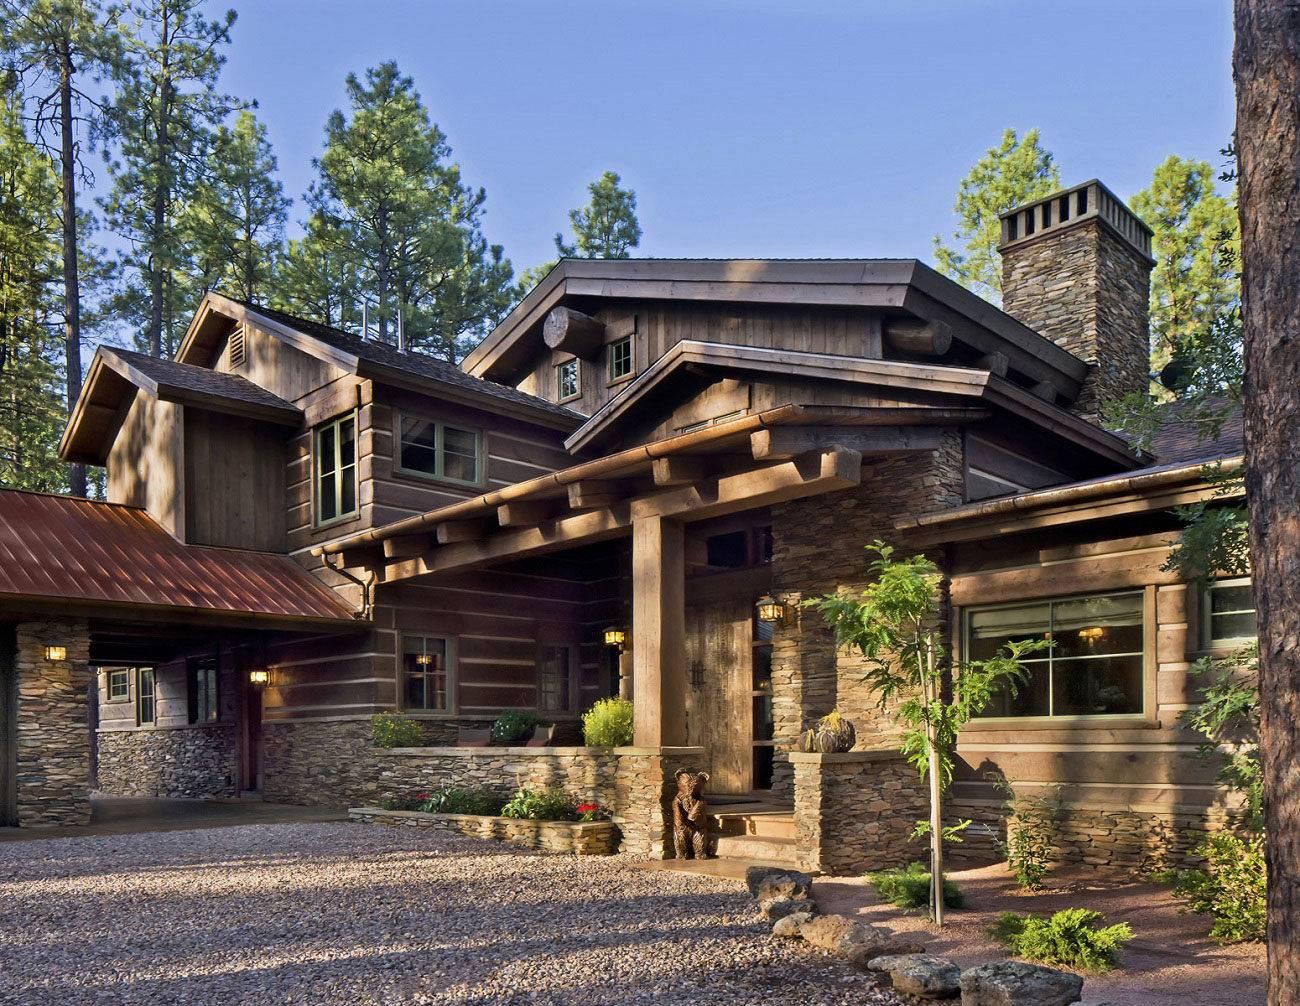 Wood Stone House Plans Mvbjournal Home Plans Blueprints 82635